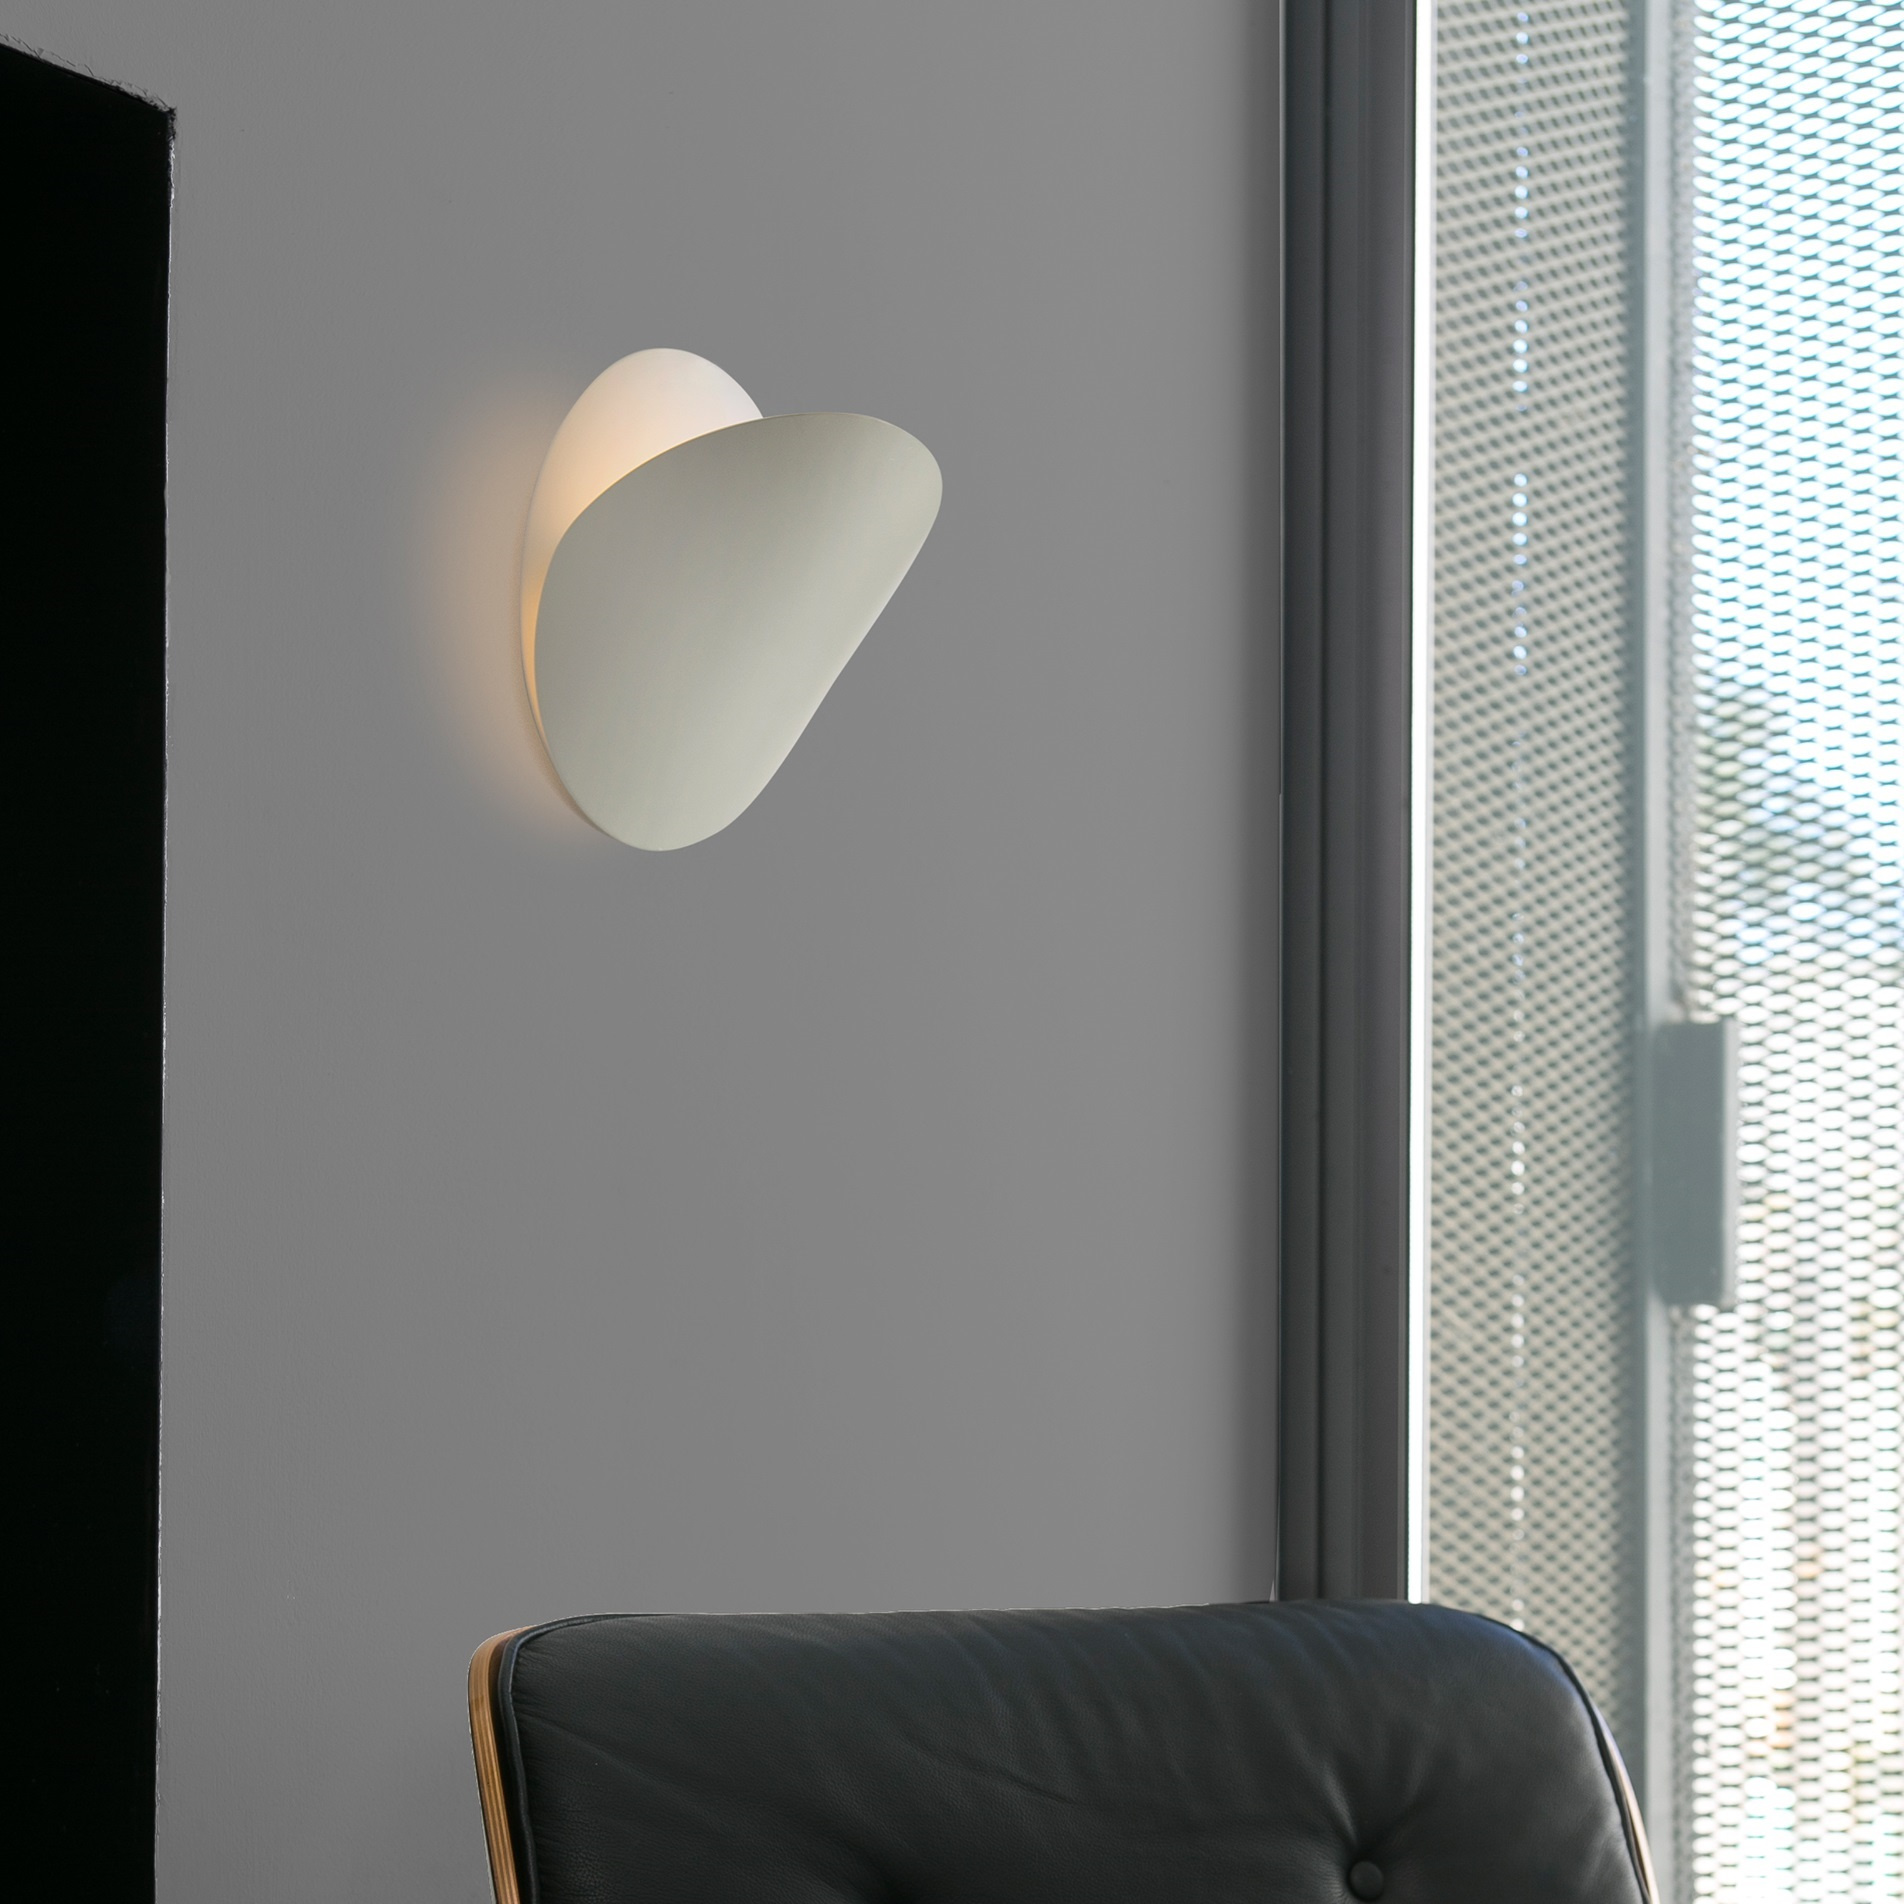 eclairage mural perfect eclairage mural exterieur led les. Black Bedroom Furniture Sets. Home Design Ideas